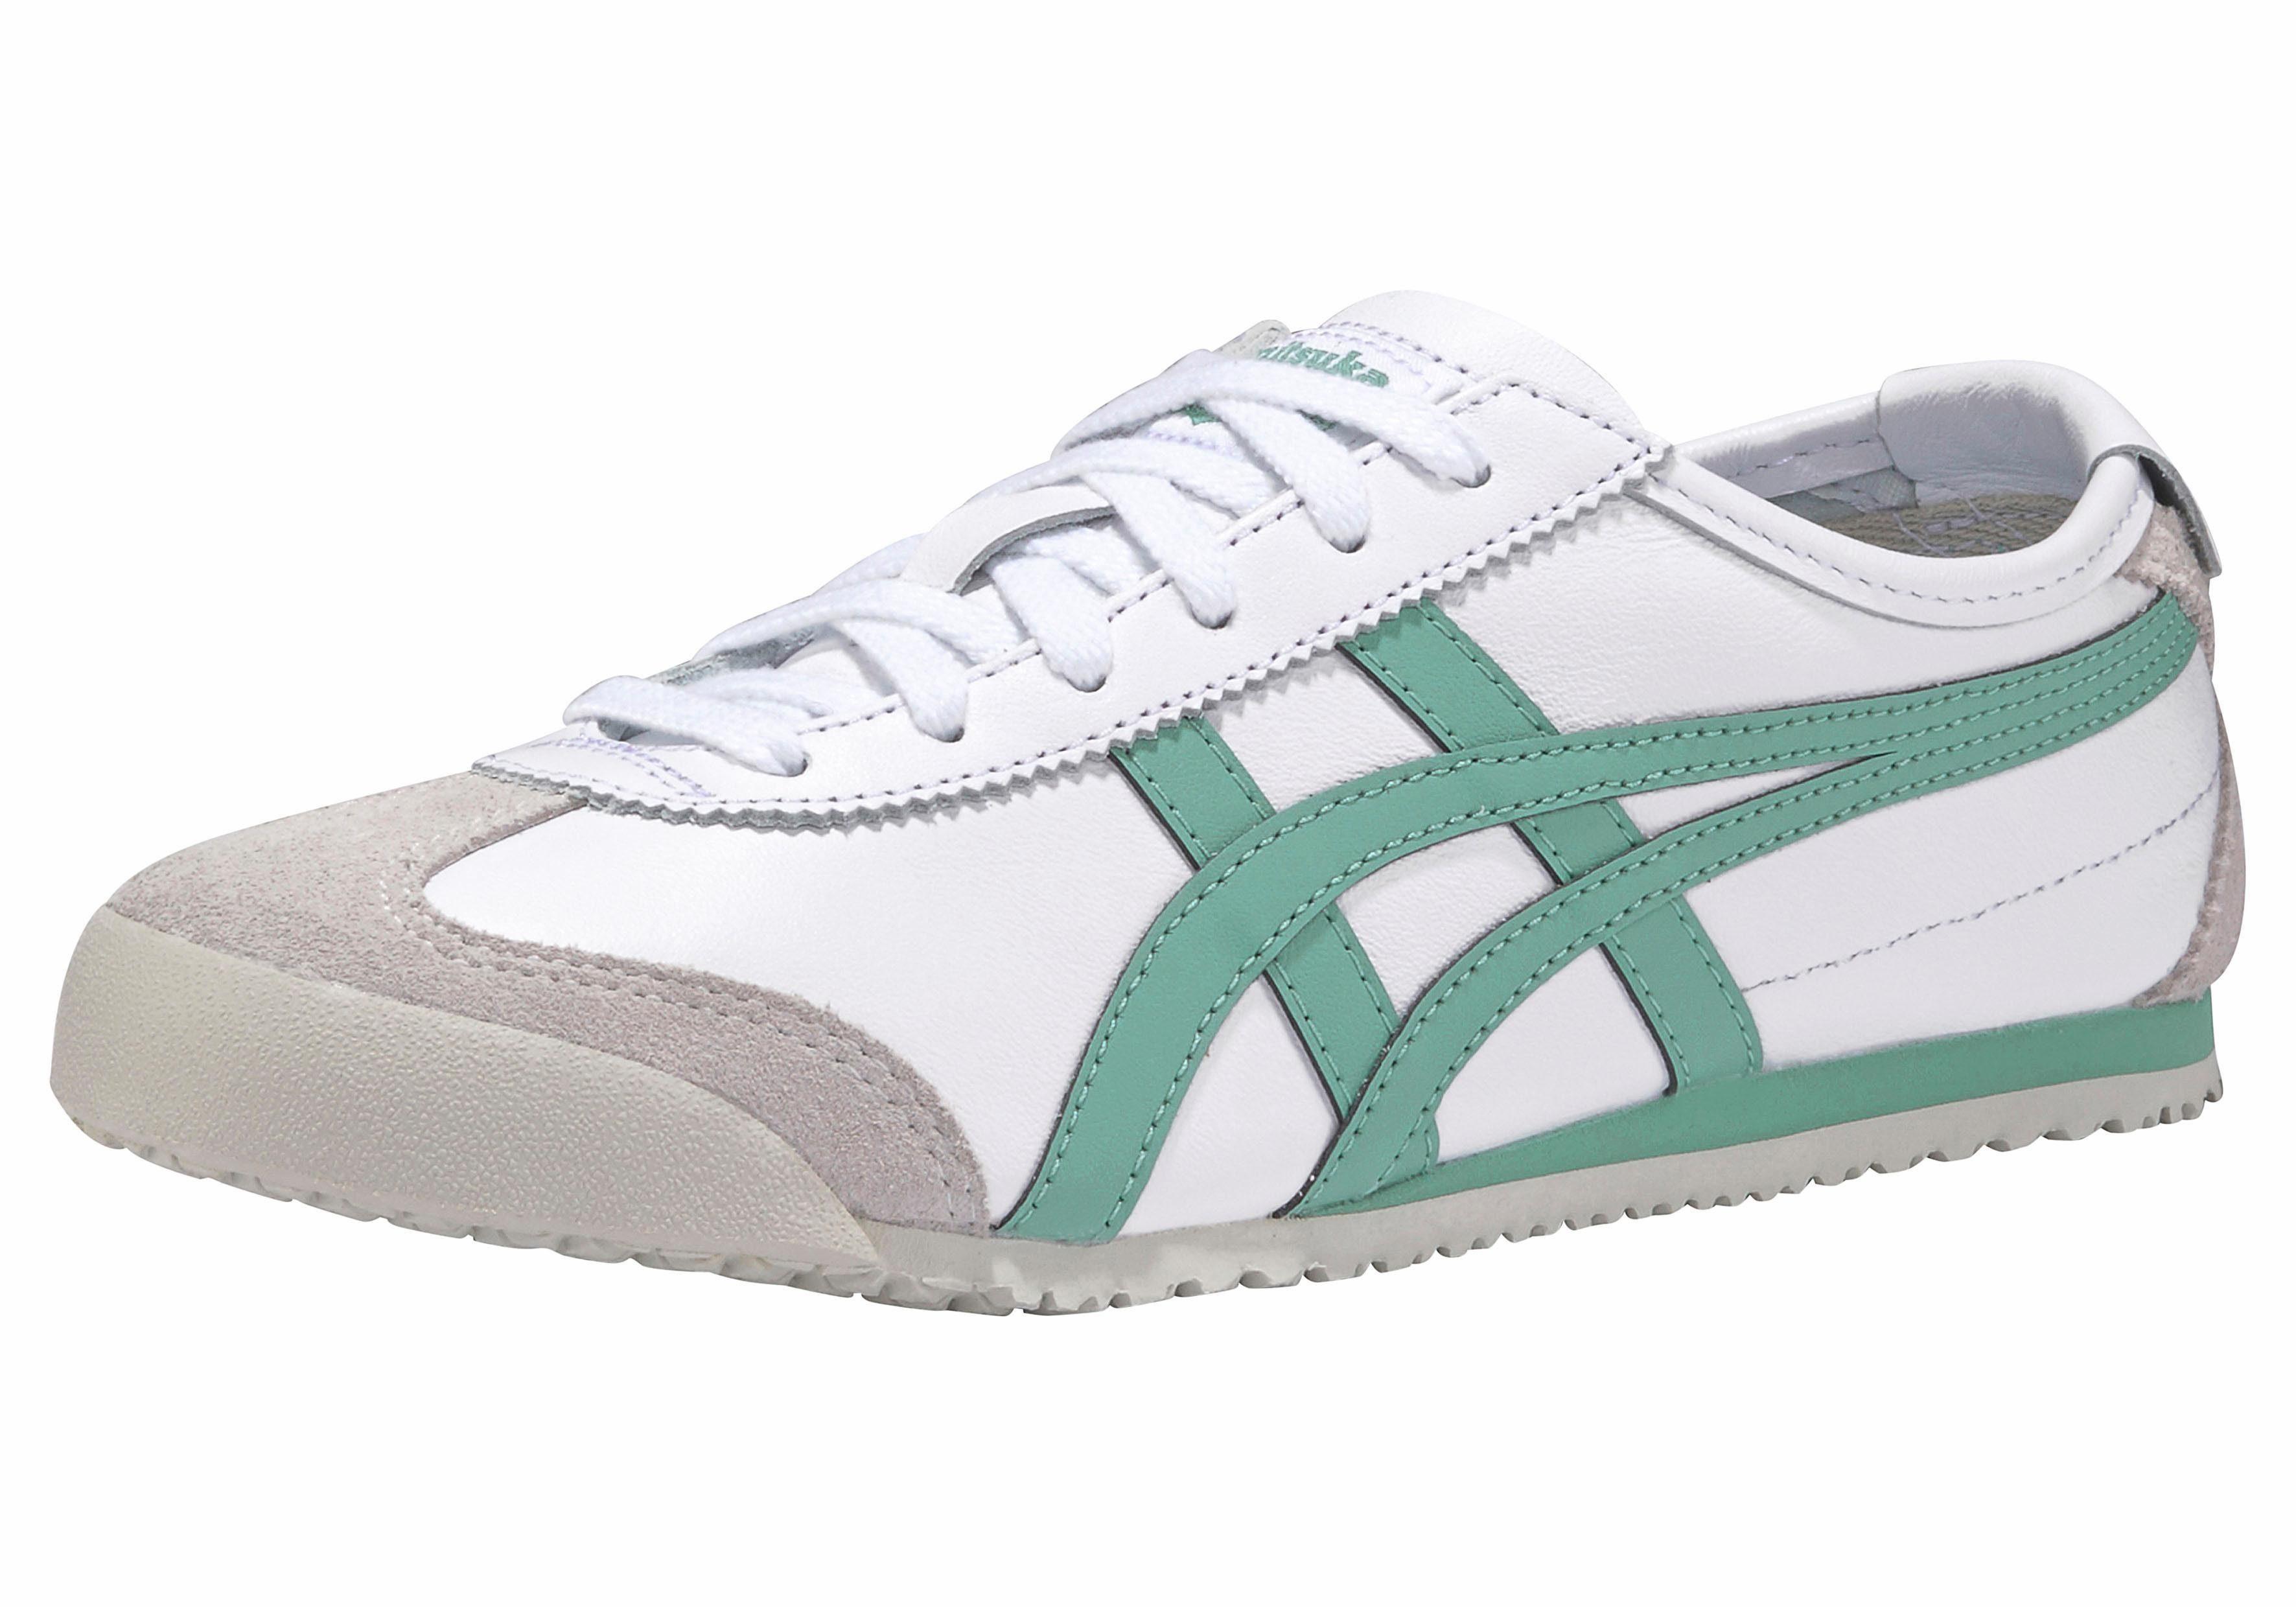 Onitsuka Tiger Mexico 66 Sneaker online kaufen  weiß-mint